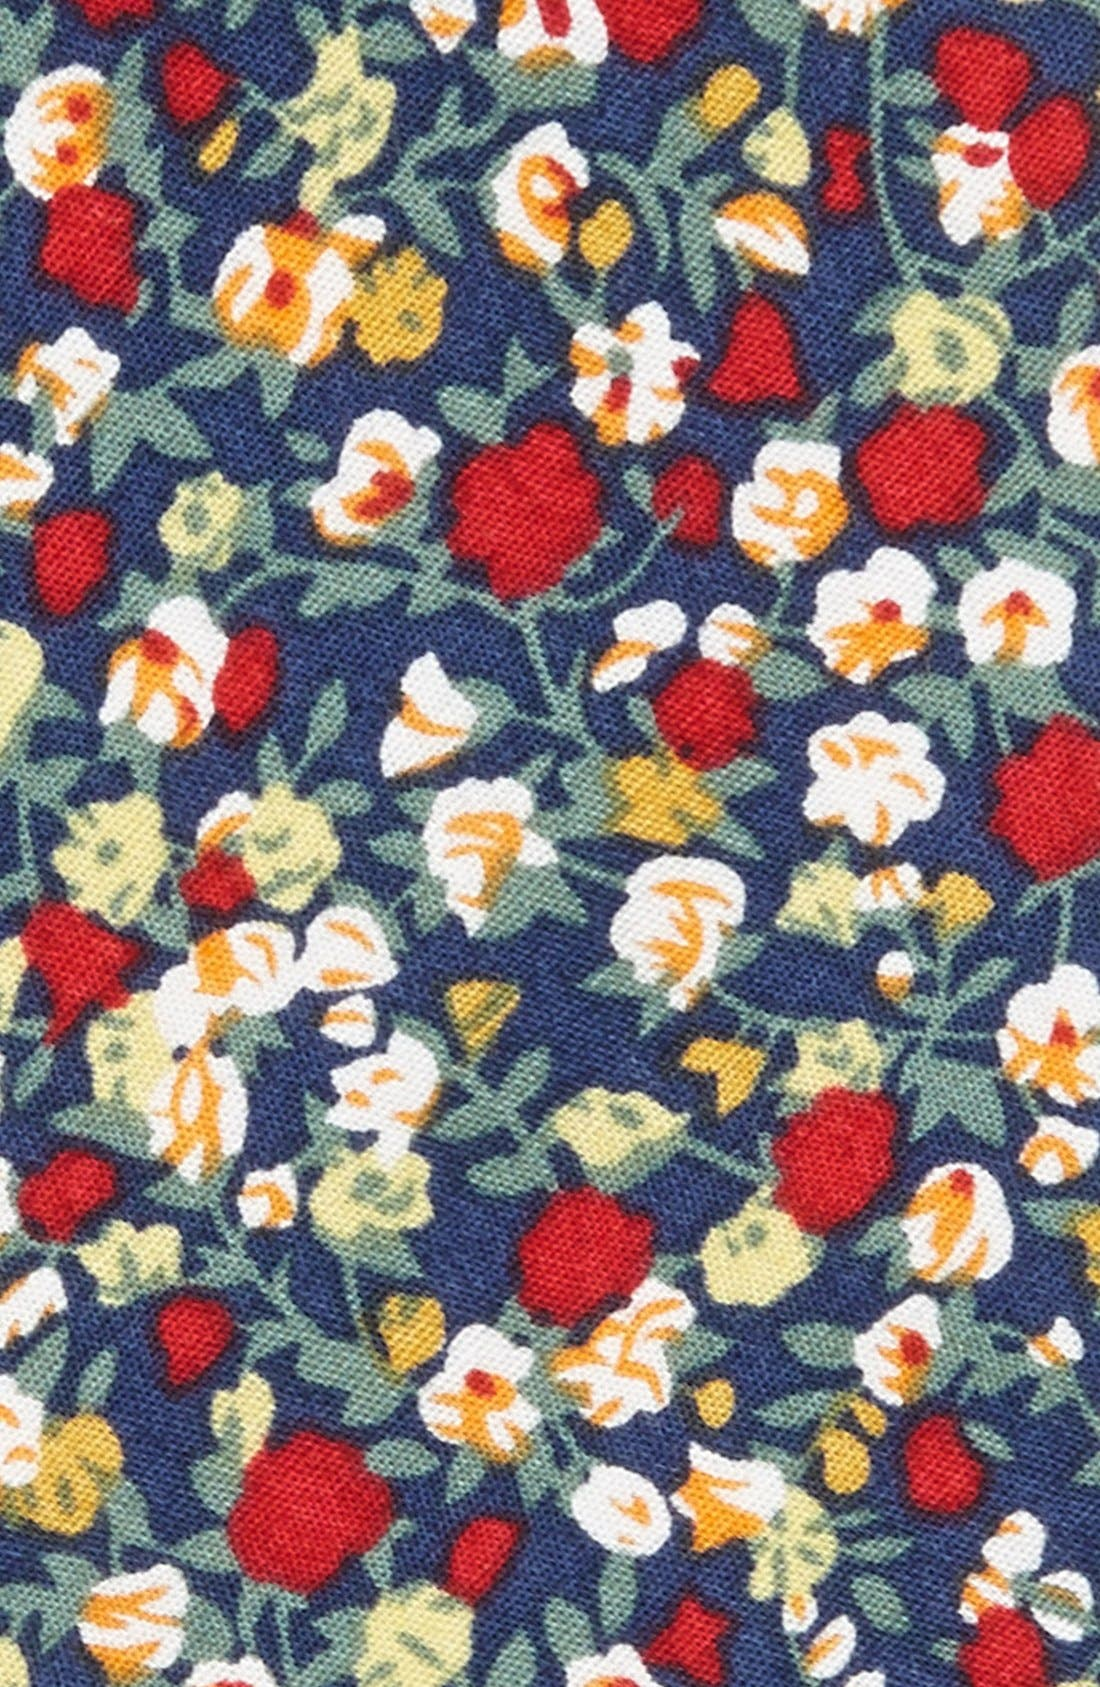 Alternate Image 2  - Topman Floral Print Woven Cotton Tie